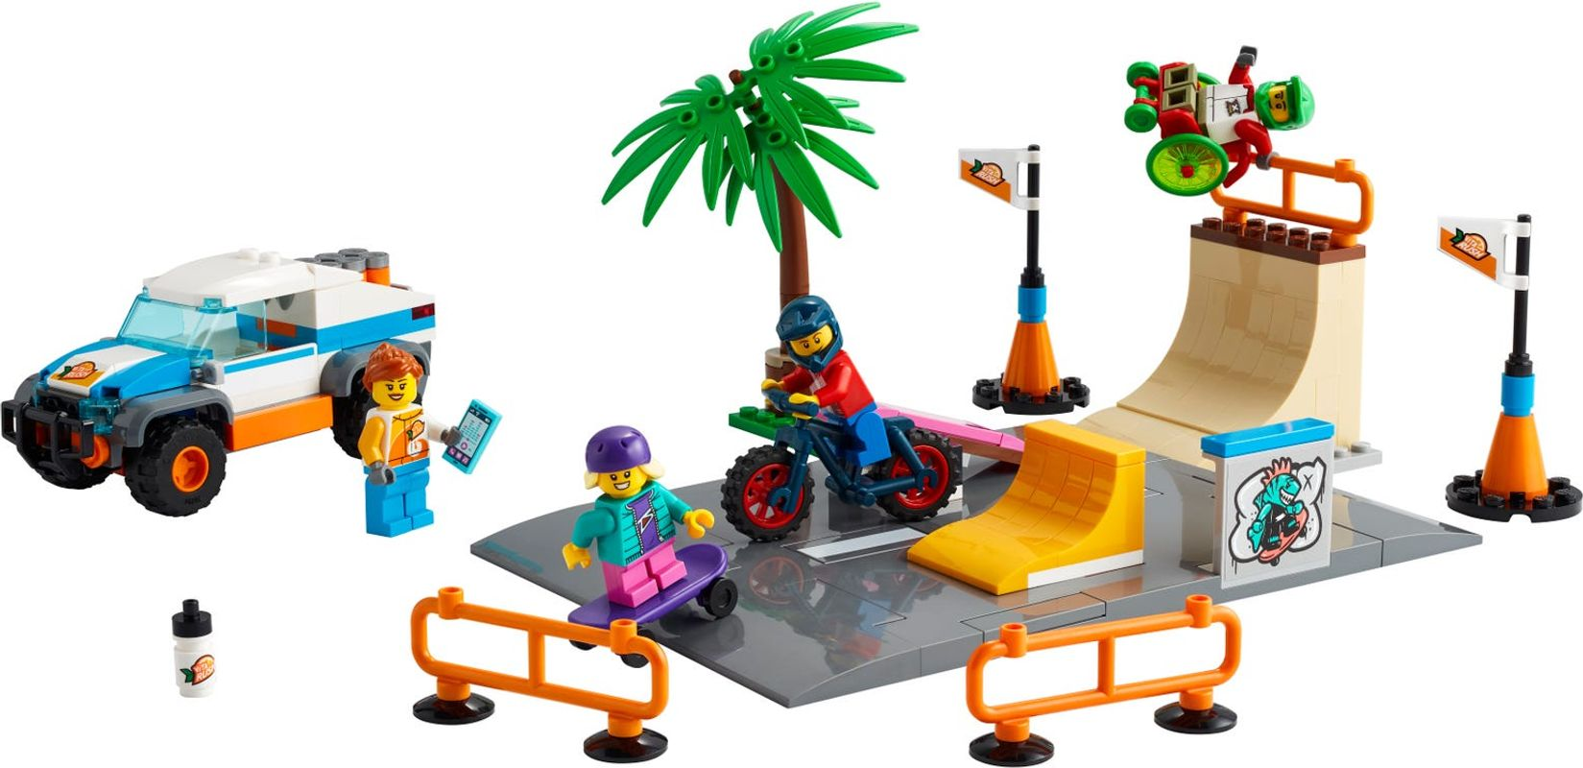 Skate Park components